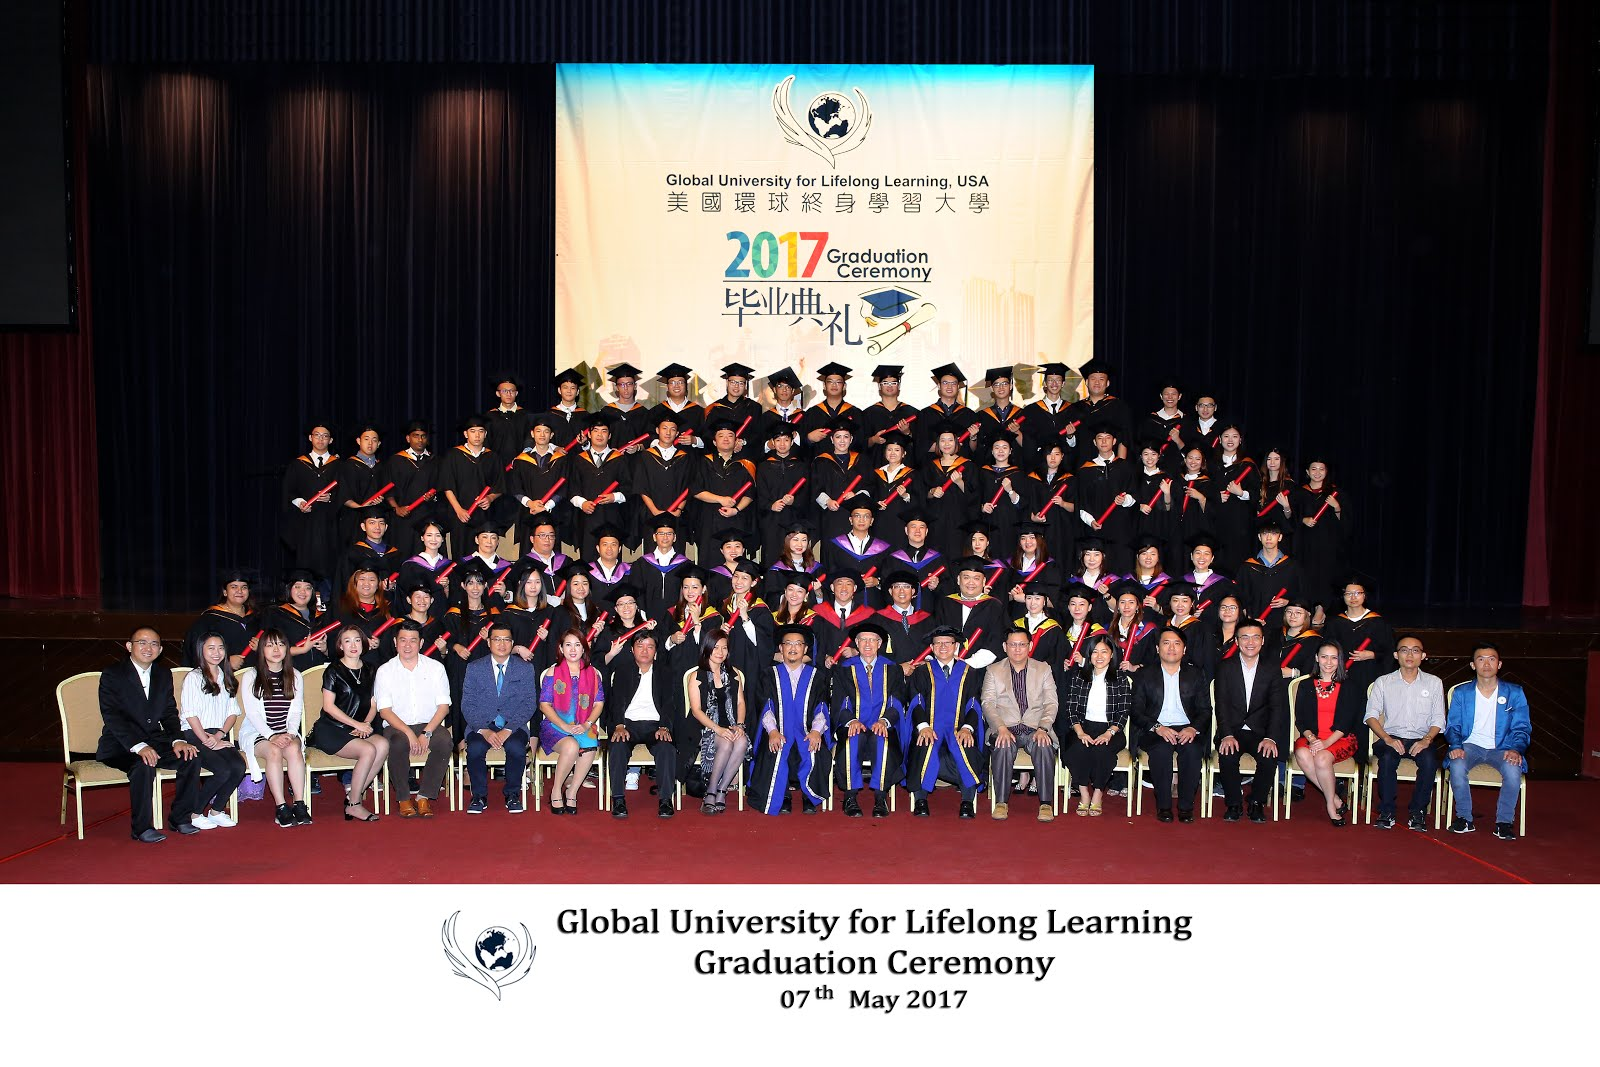 2017 Graduation 毕业典礼